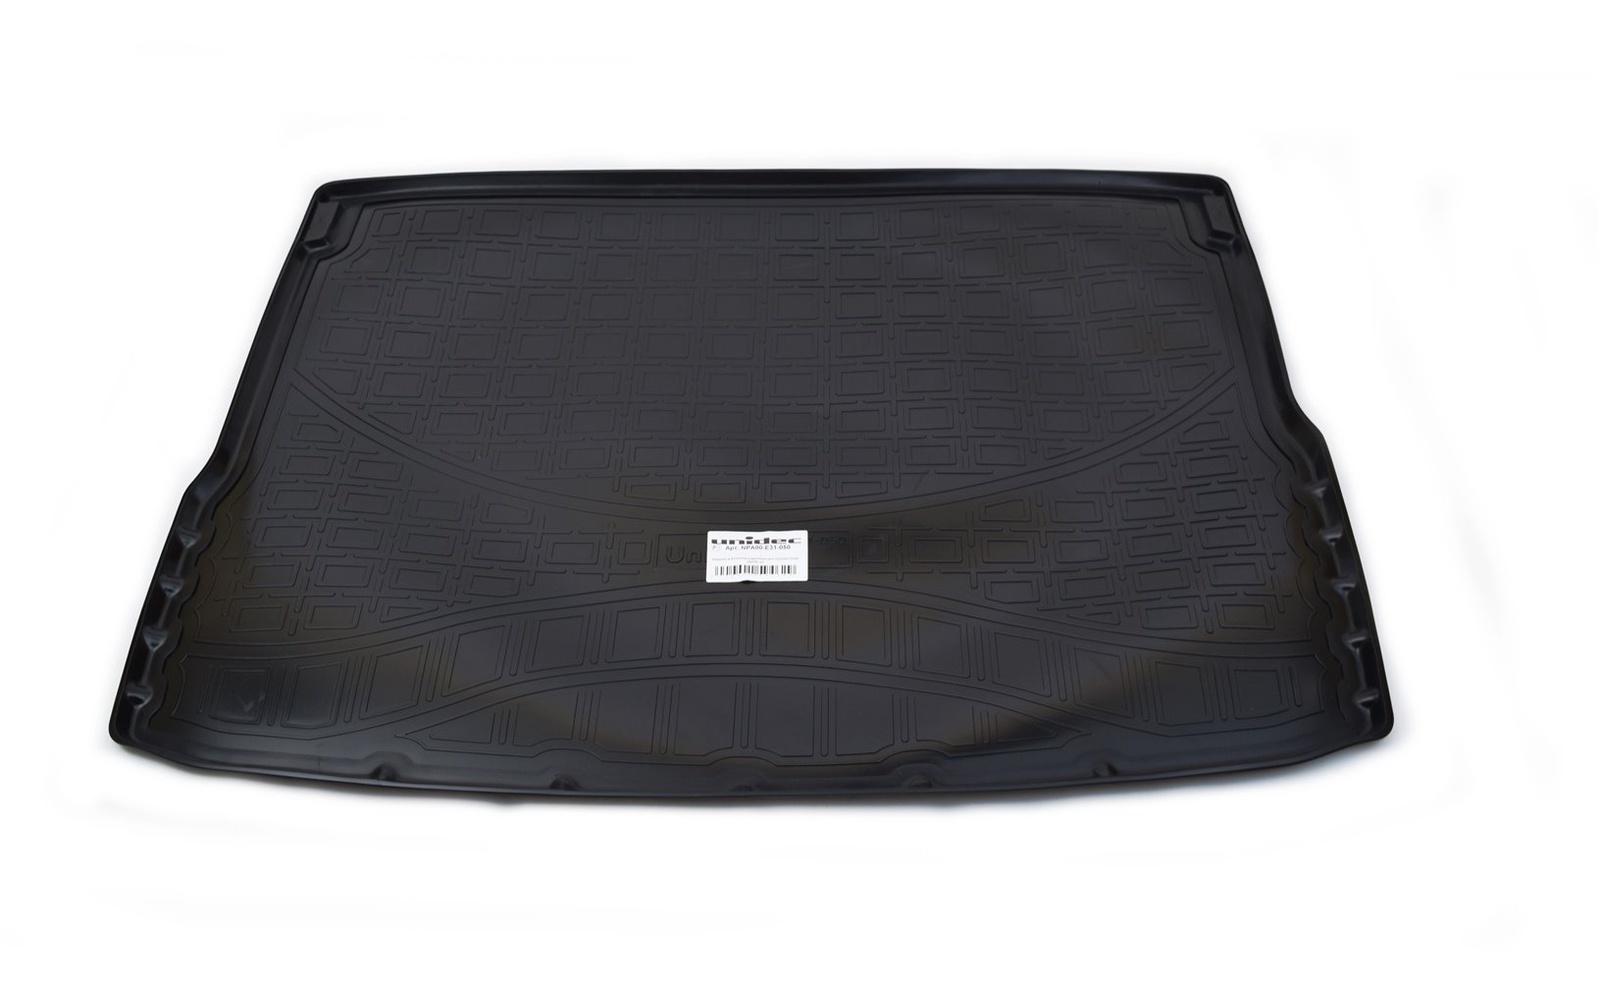 Коврик в багажник Norplast npa00-e43-265 коврик в багажник norplast npa00 t63 910